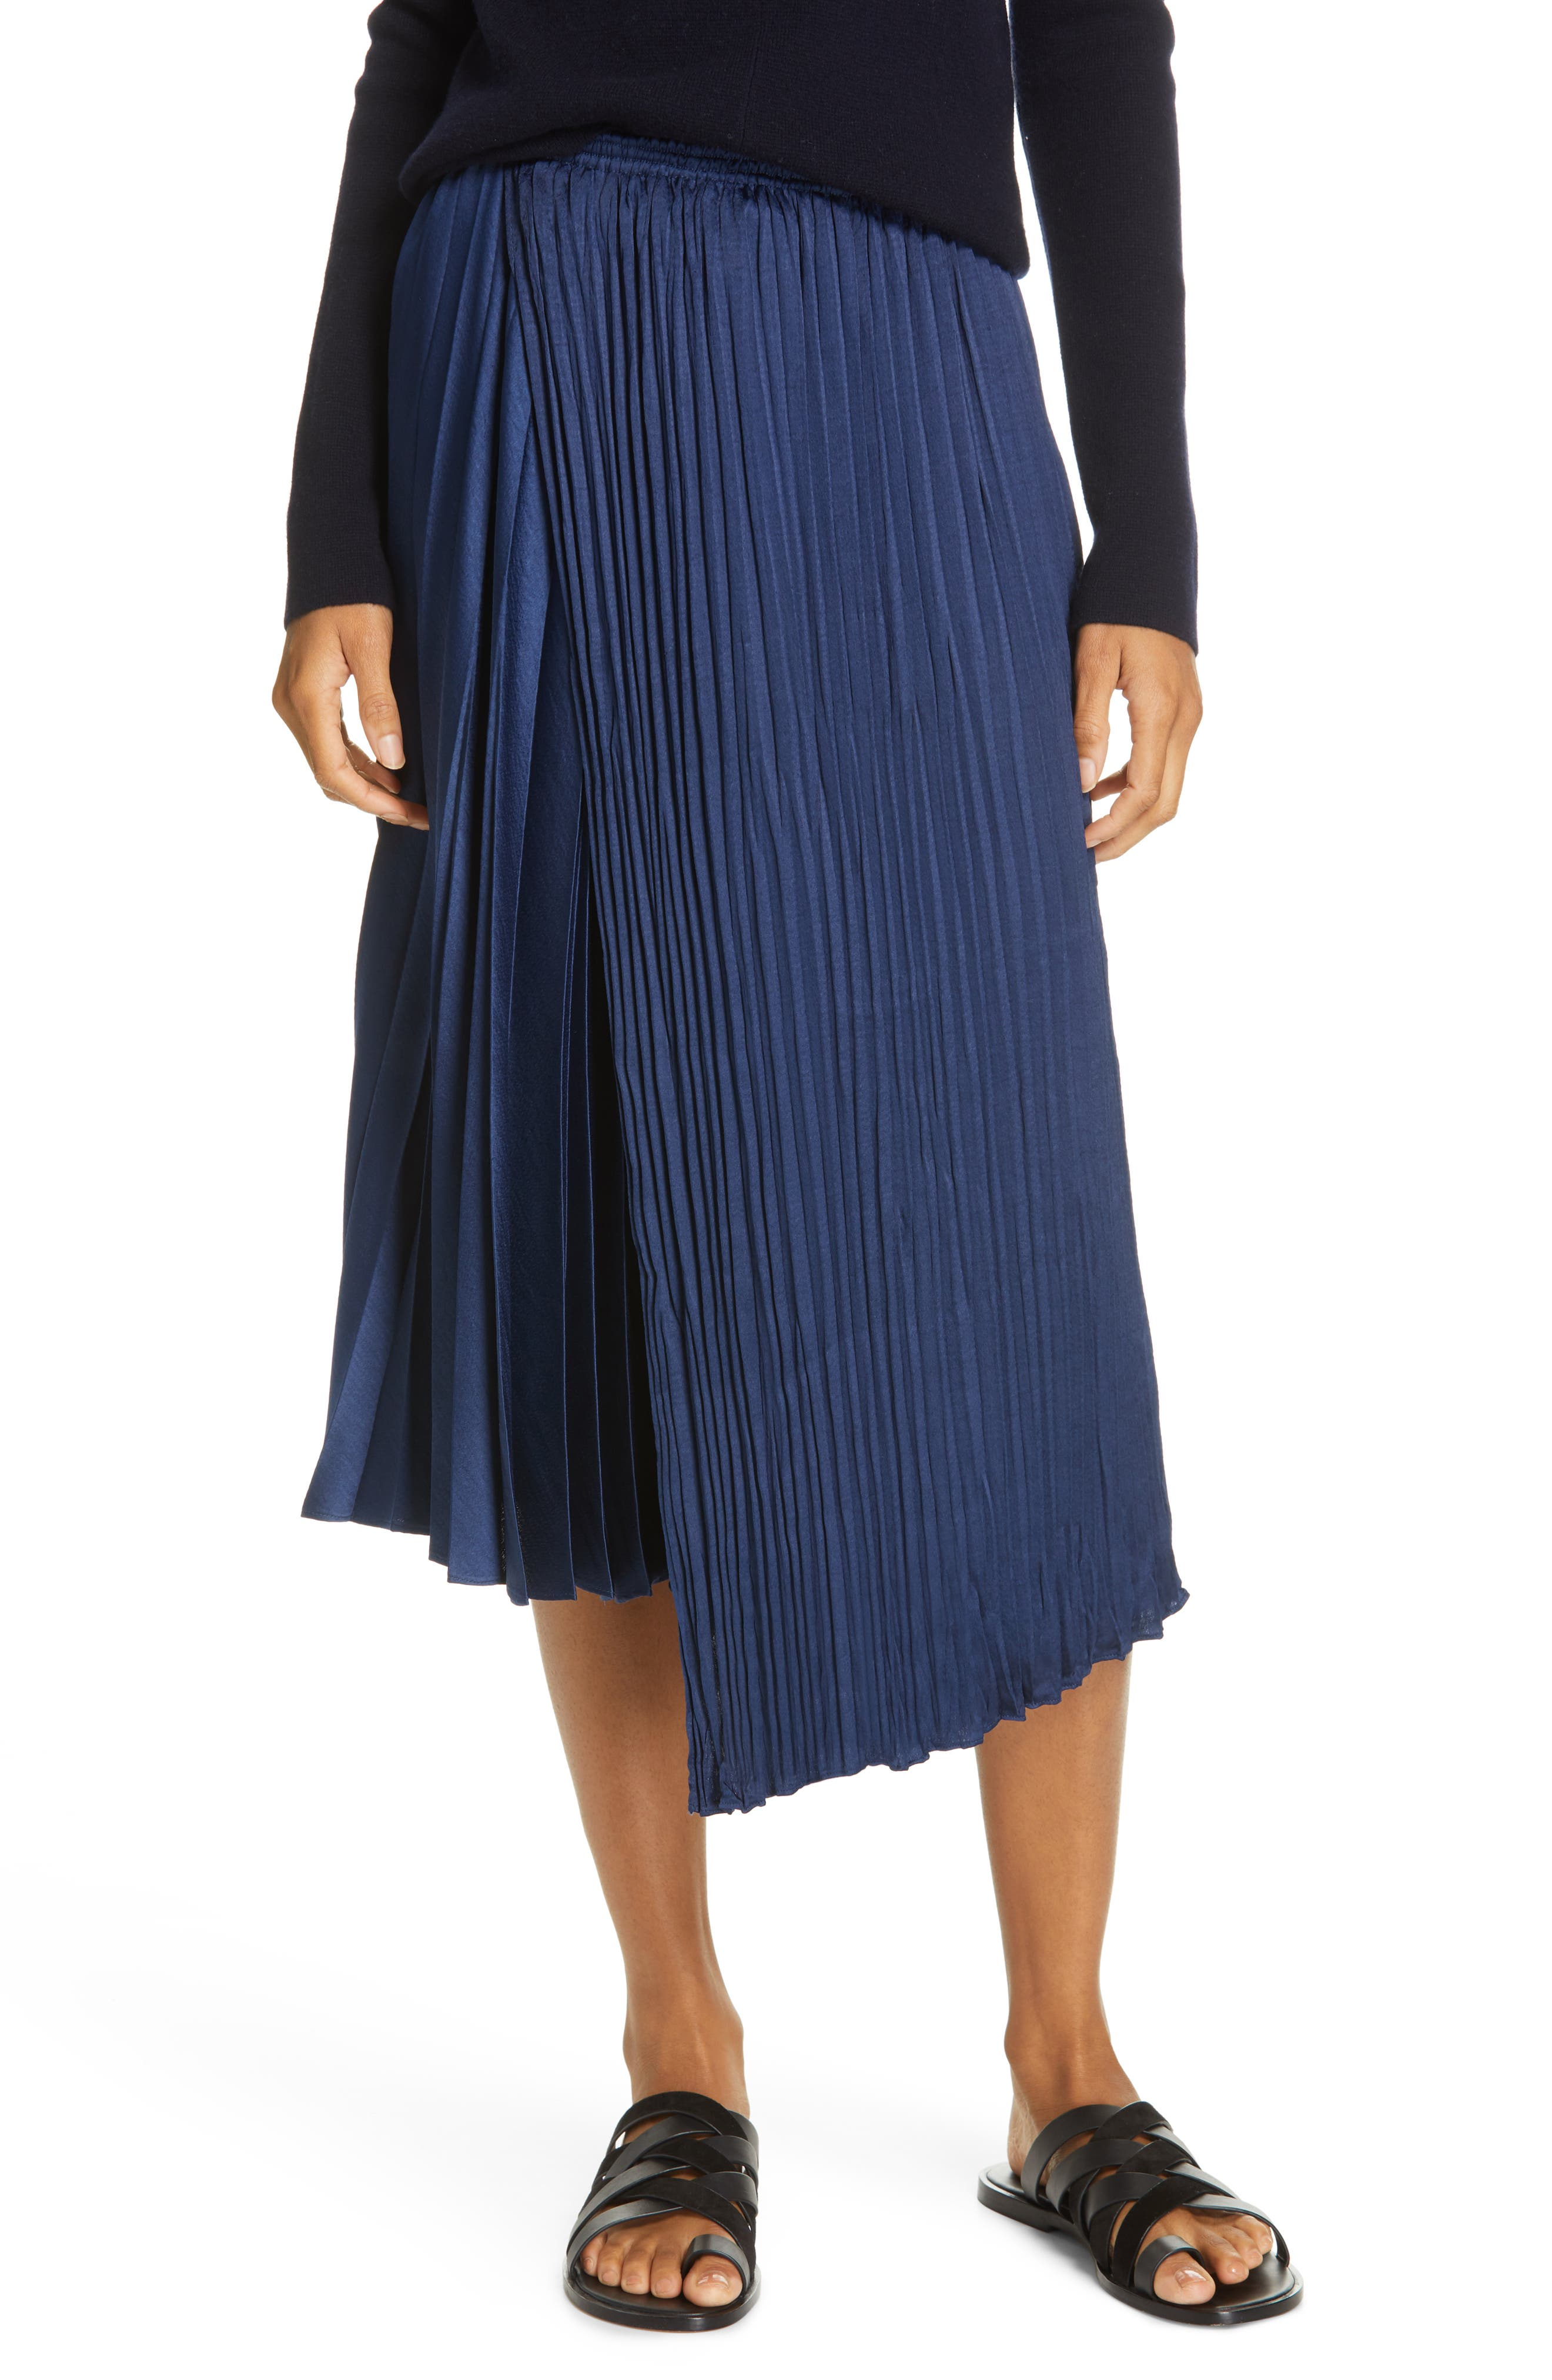 Skirts Women's Clothing Mixed Blues Size 11 Black Pleated Skirt